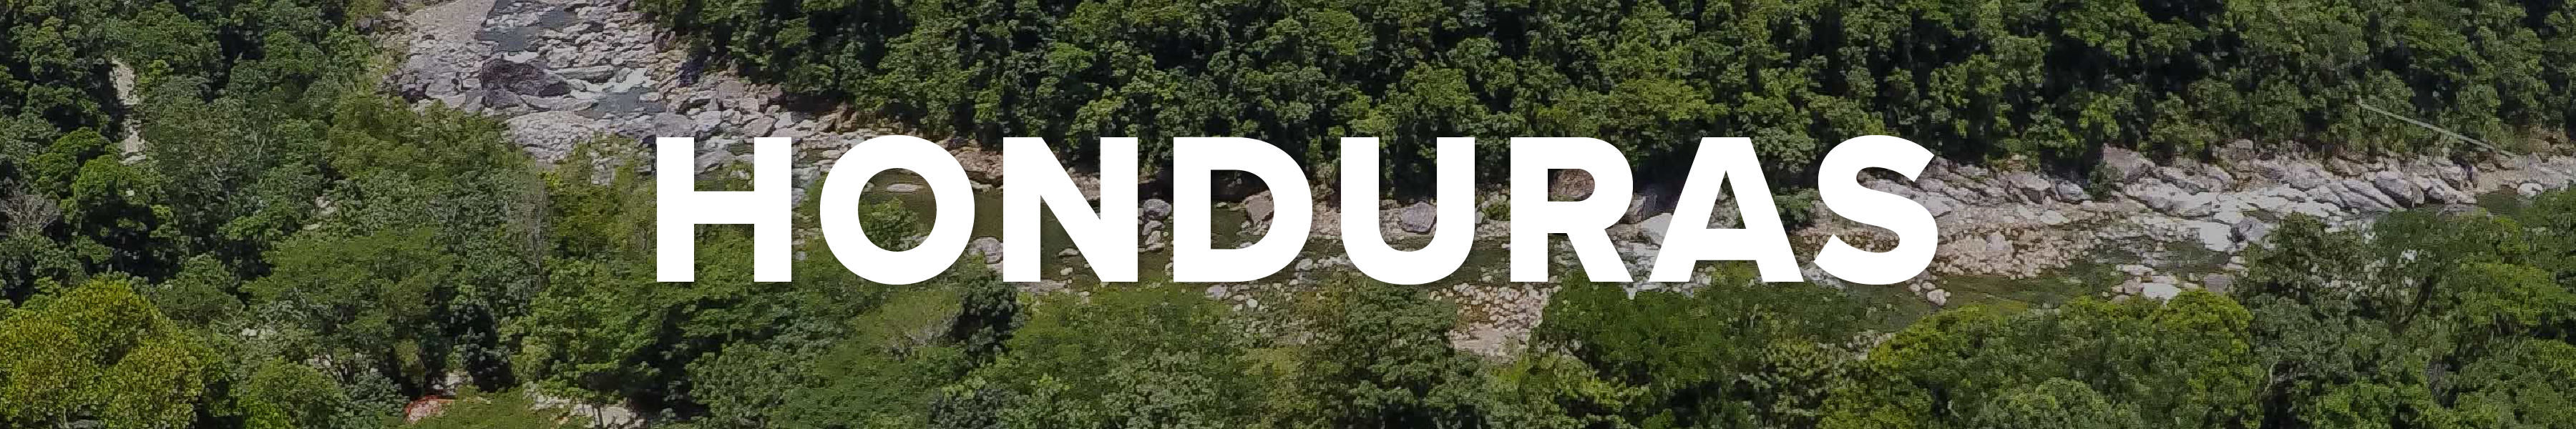 Honduras Banner